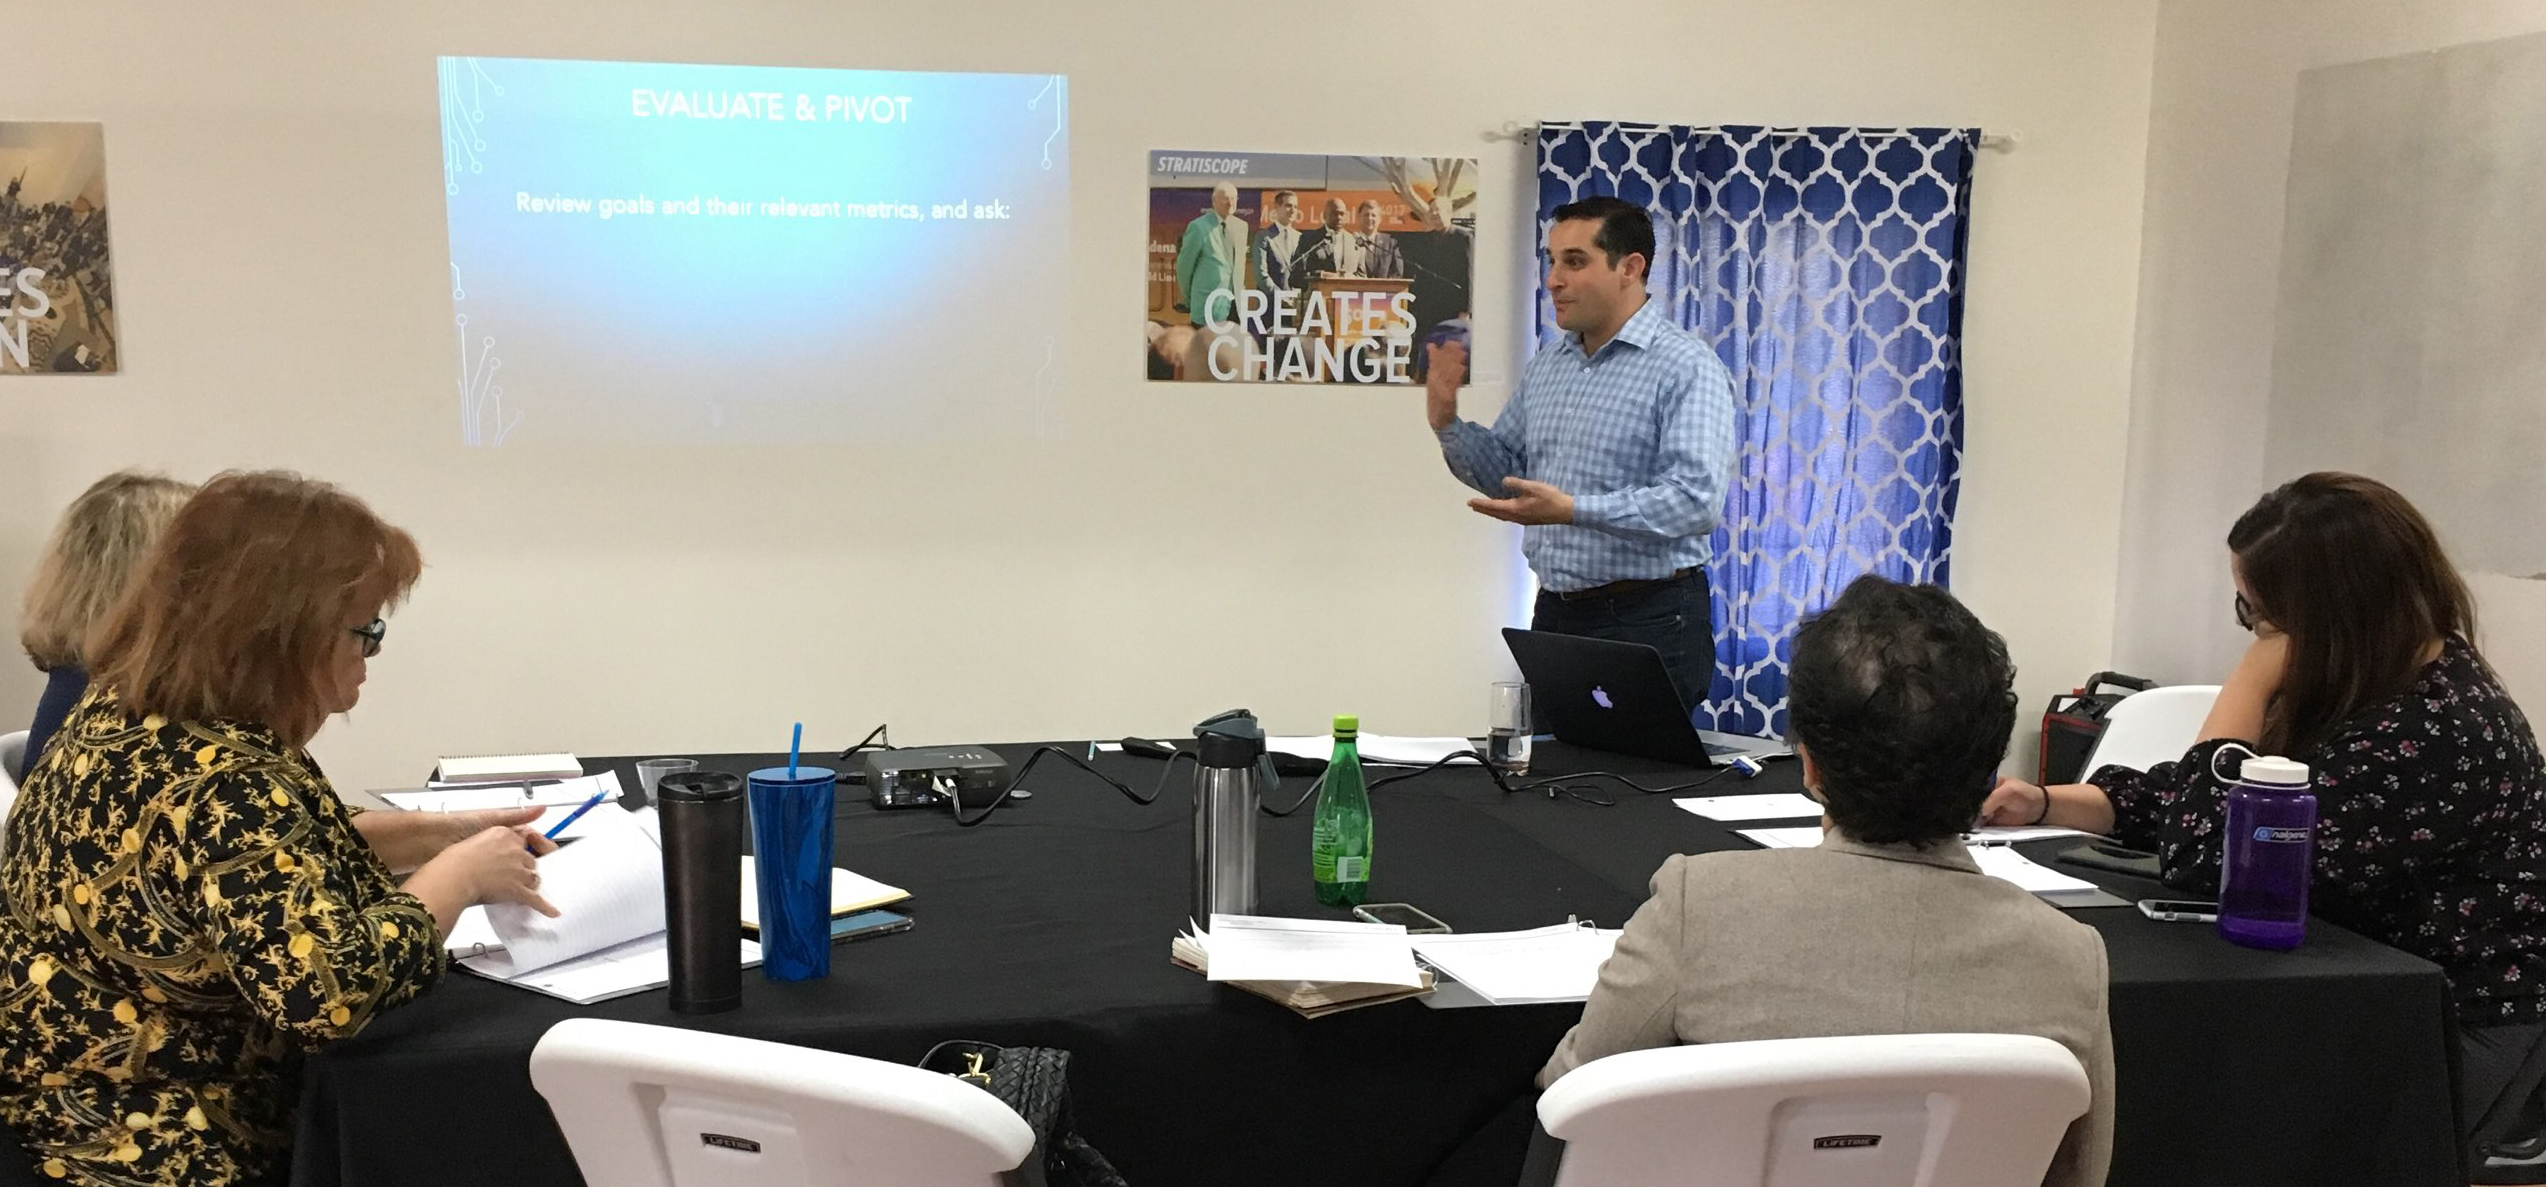 Stratiscope offers a range of leadership training programs